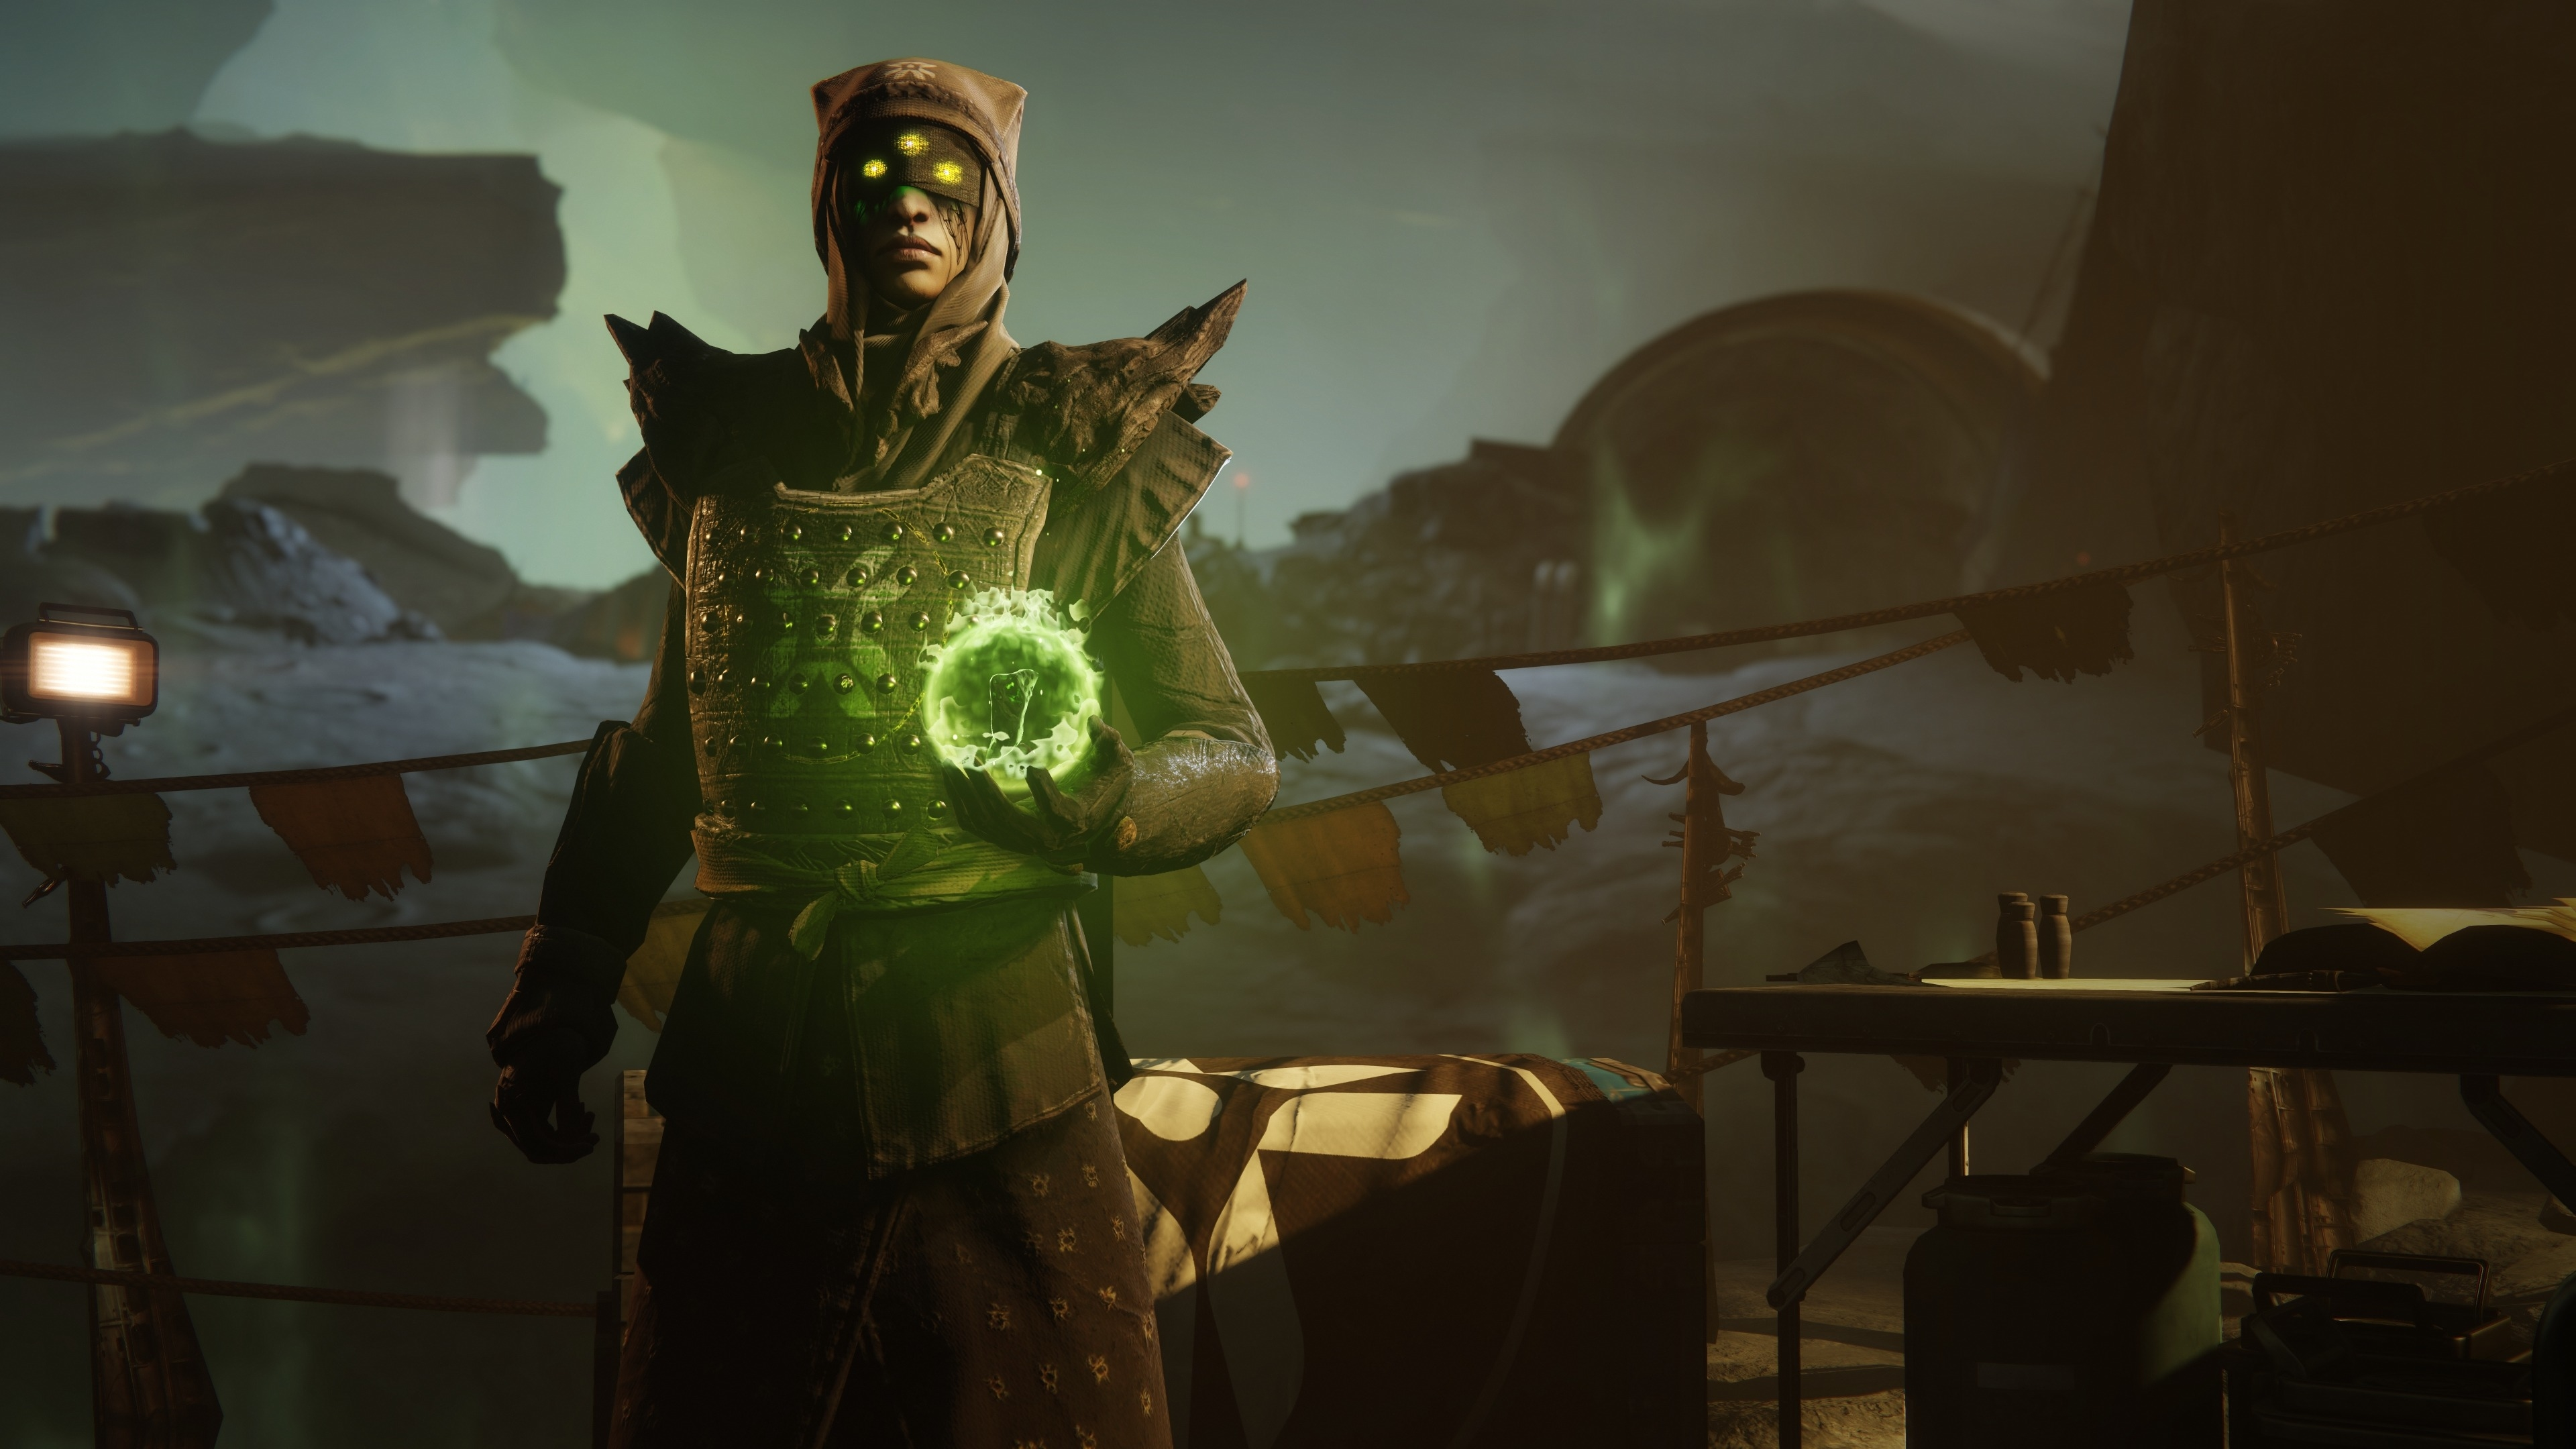 Destiny 2 Shadowkeep Wallpaper Hd Games 4k Wallpapers Images